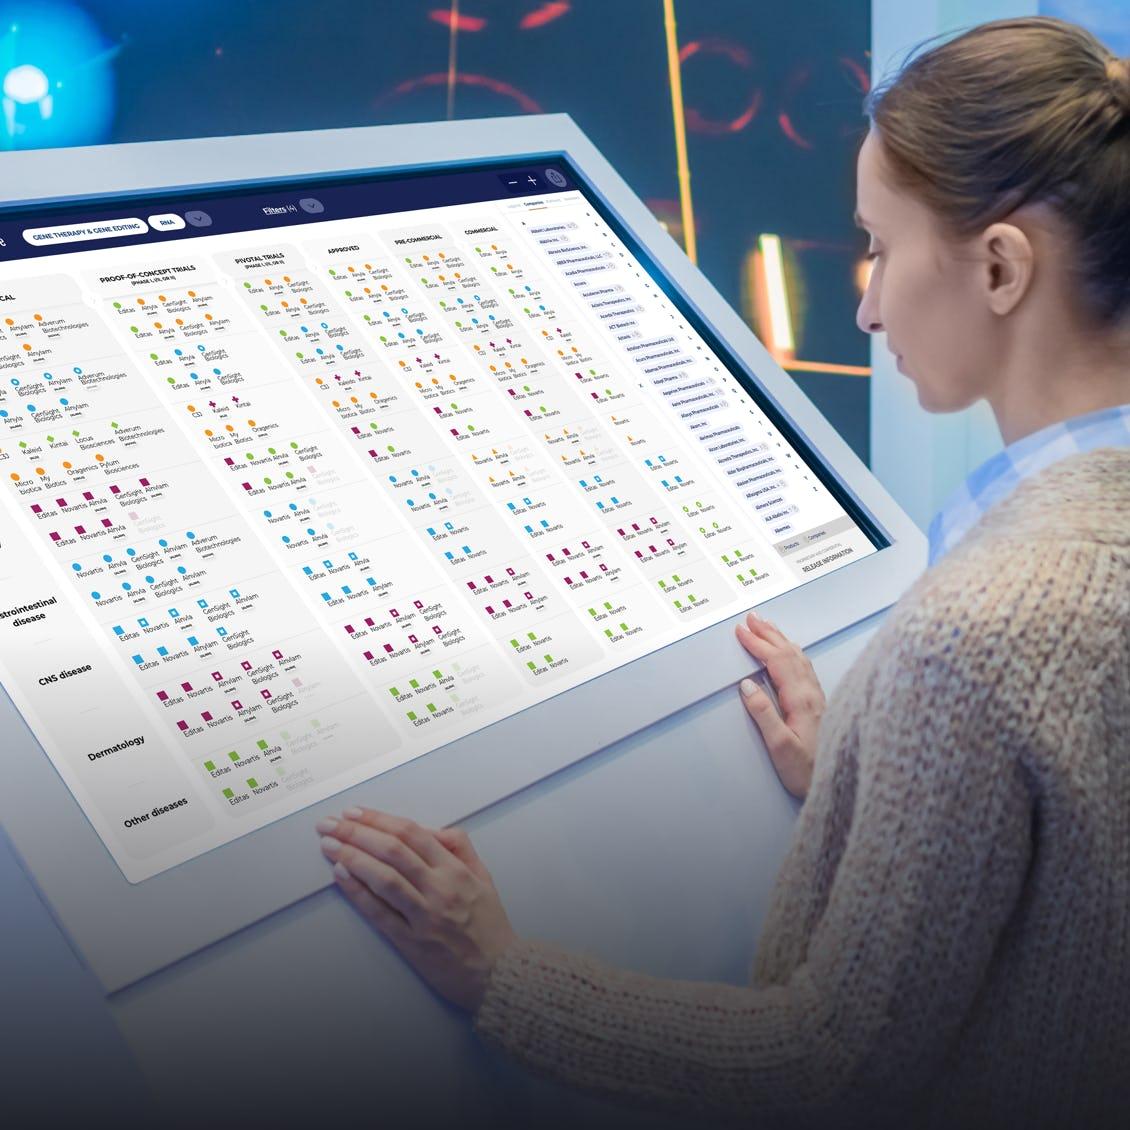 Woman looking at a big Chardan Capital screen